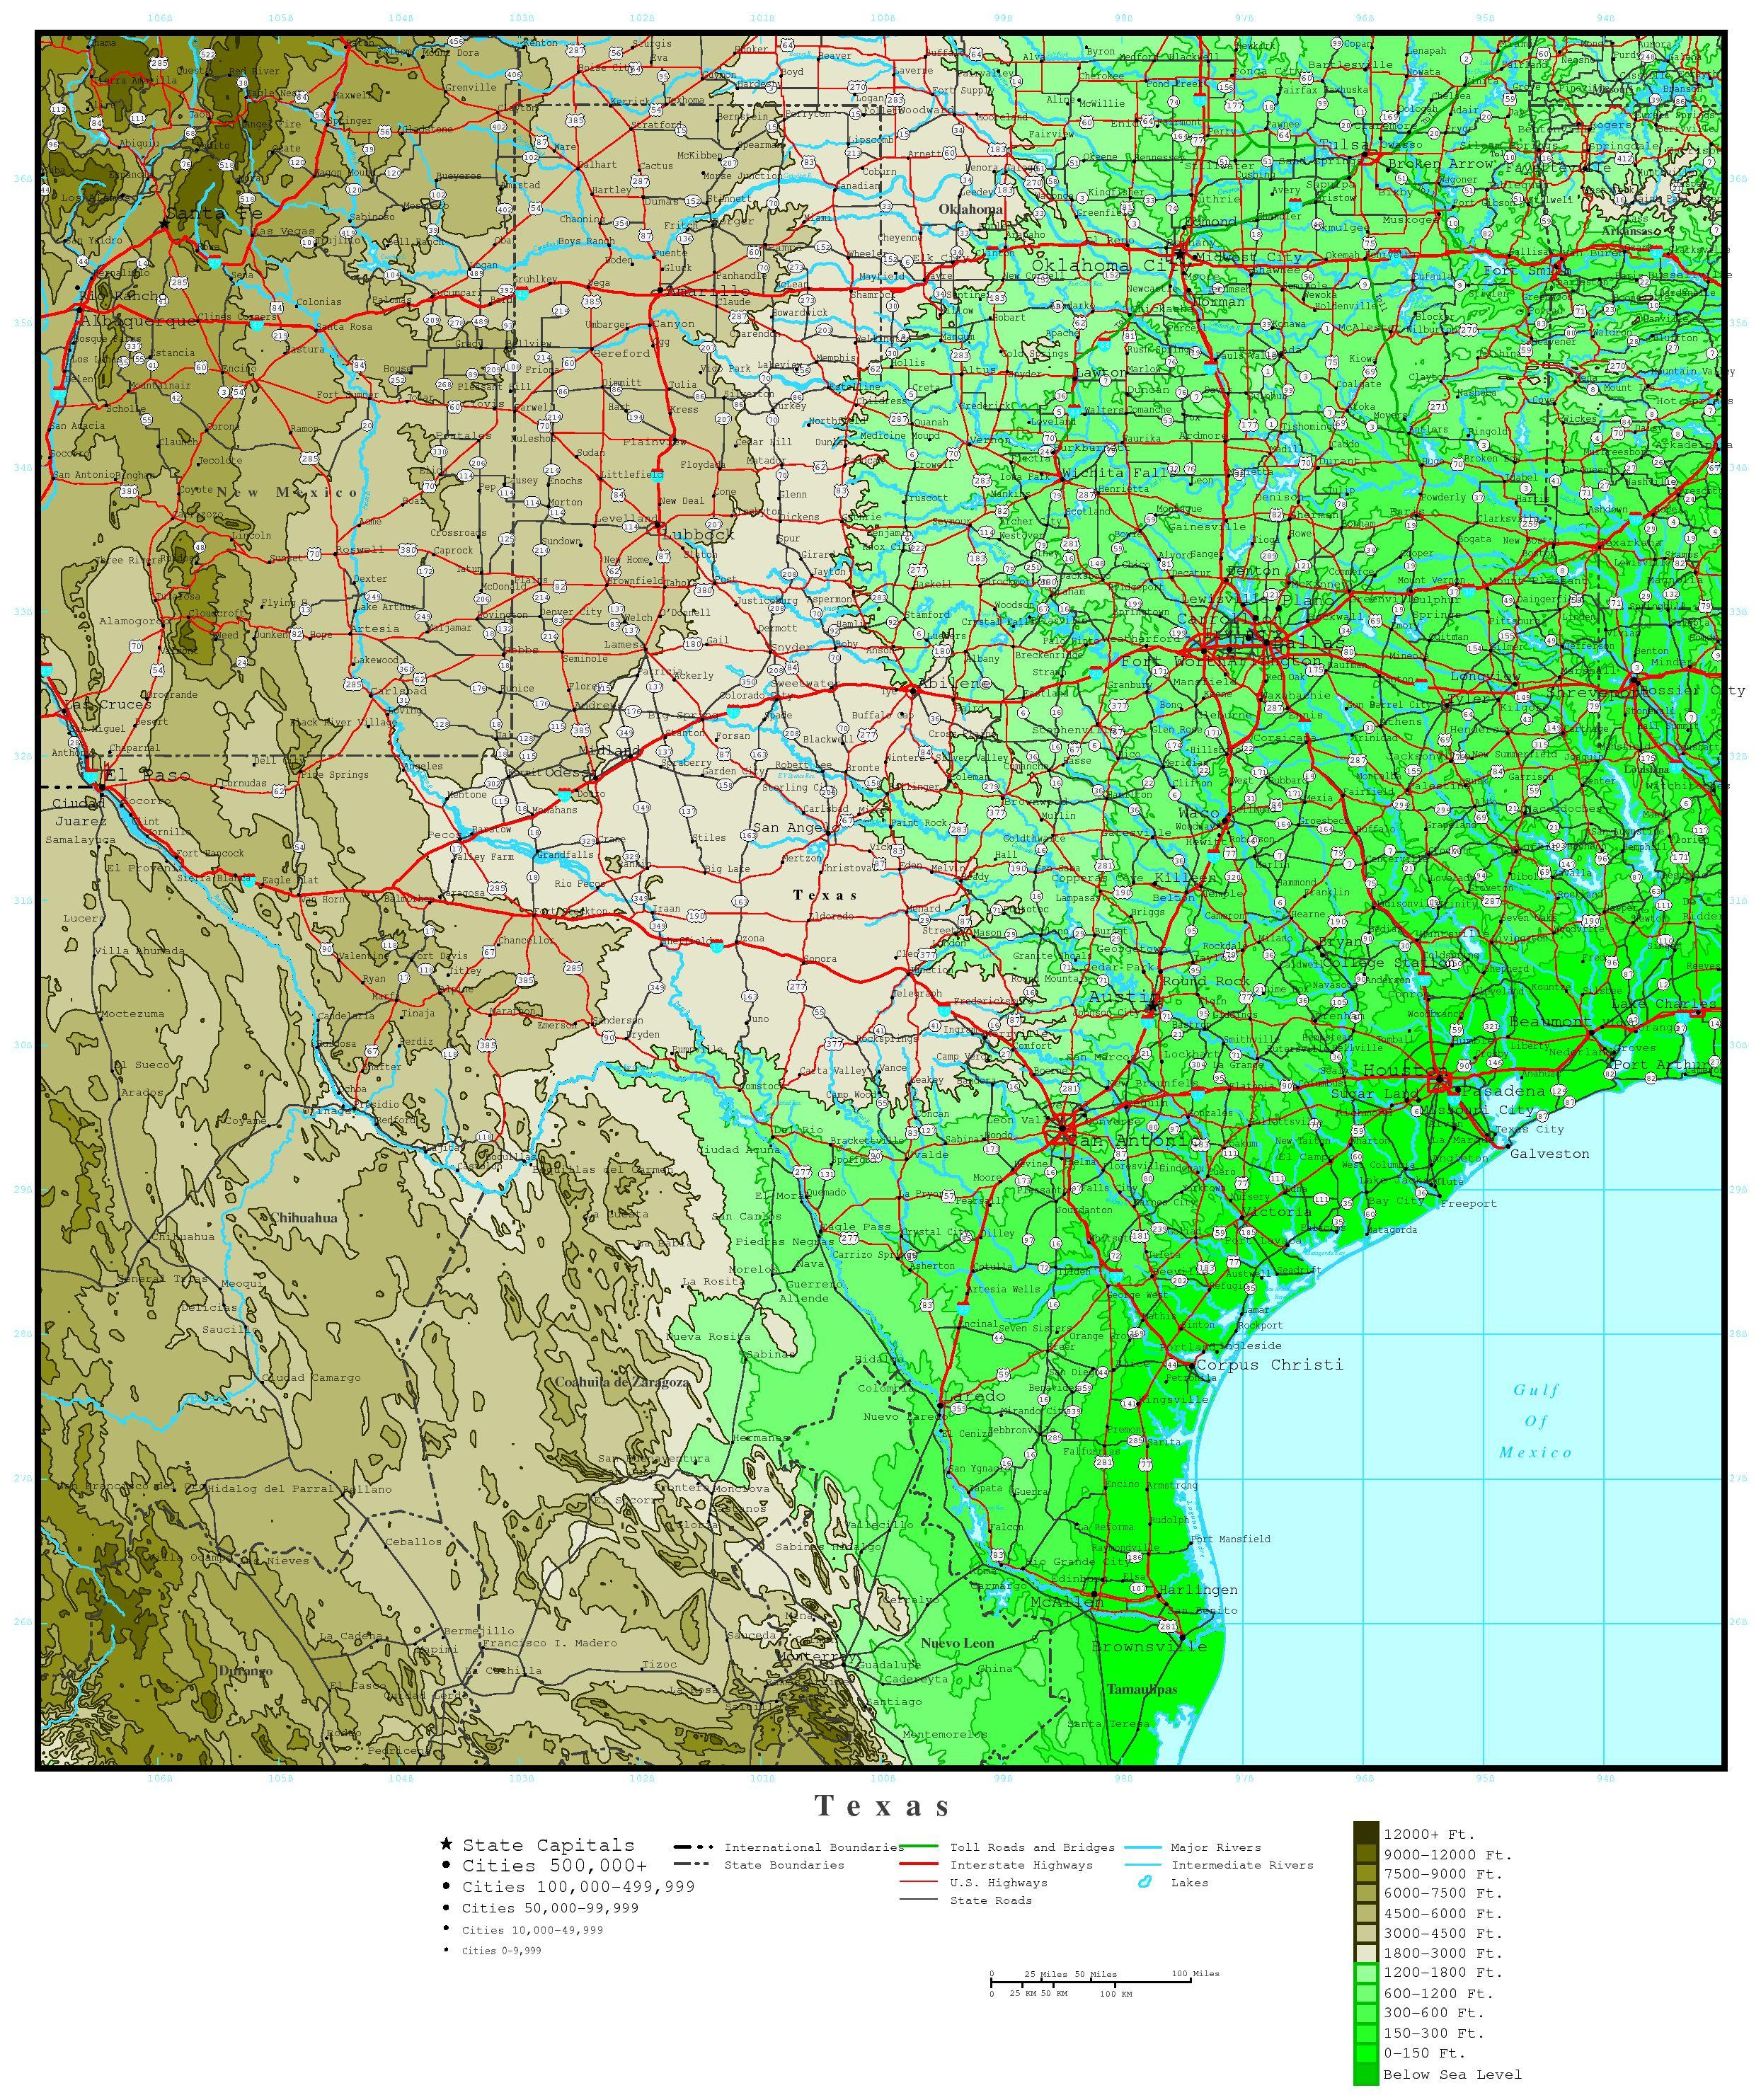 City Map Of Corpus Christi Texas - Link-Italia - City Map Of Corpus Christi Texas